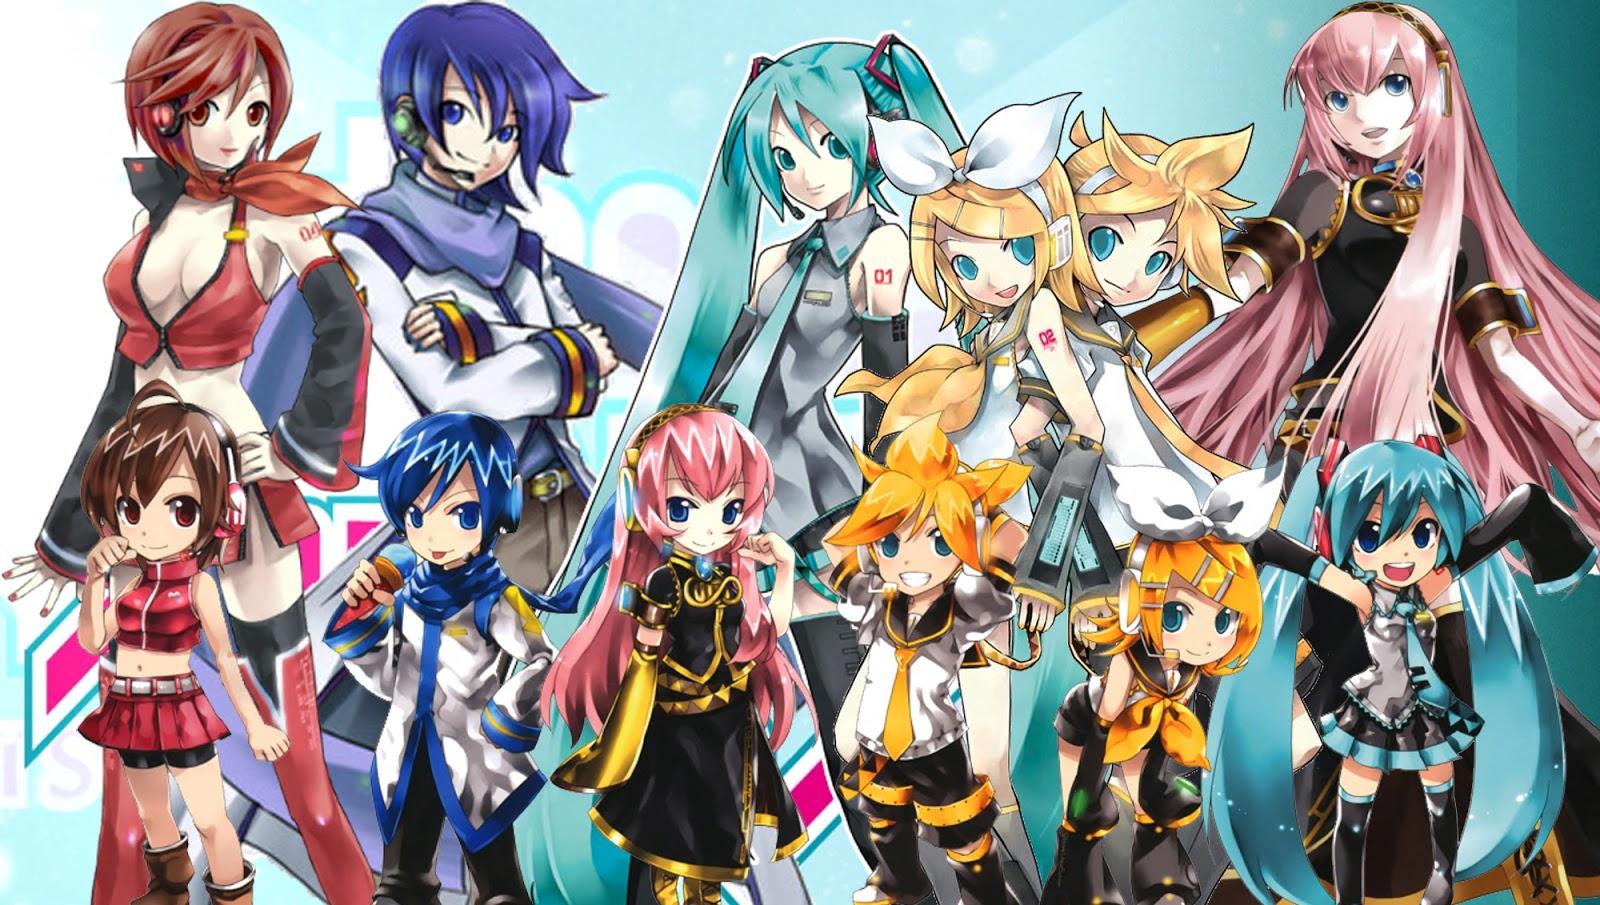 Vocaloid Chibi Group Wallpaper ¡Asombrate!: Voca...